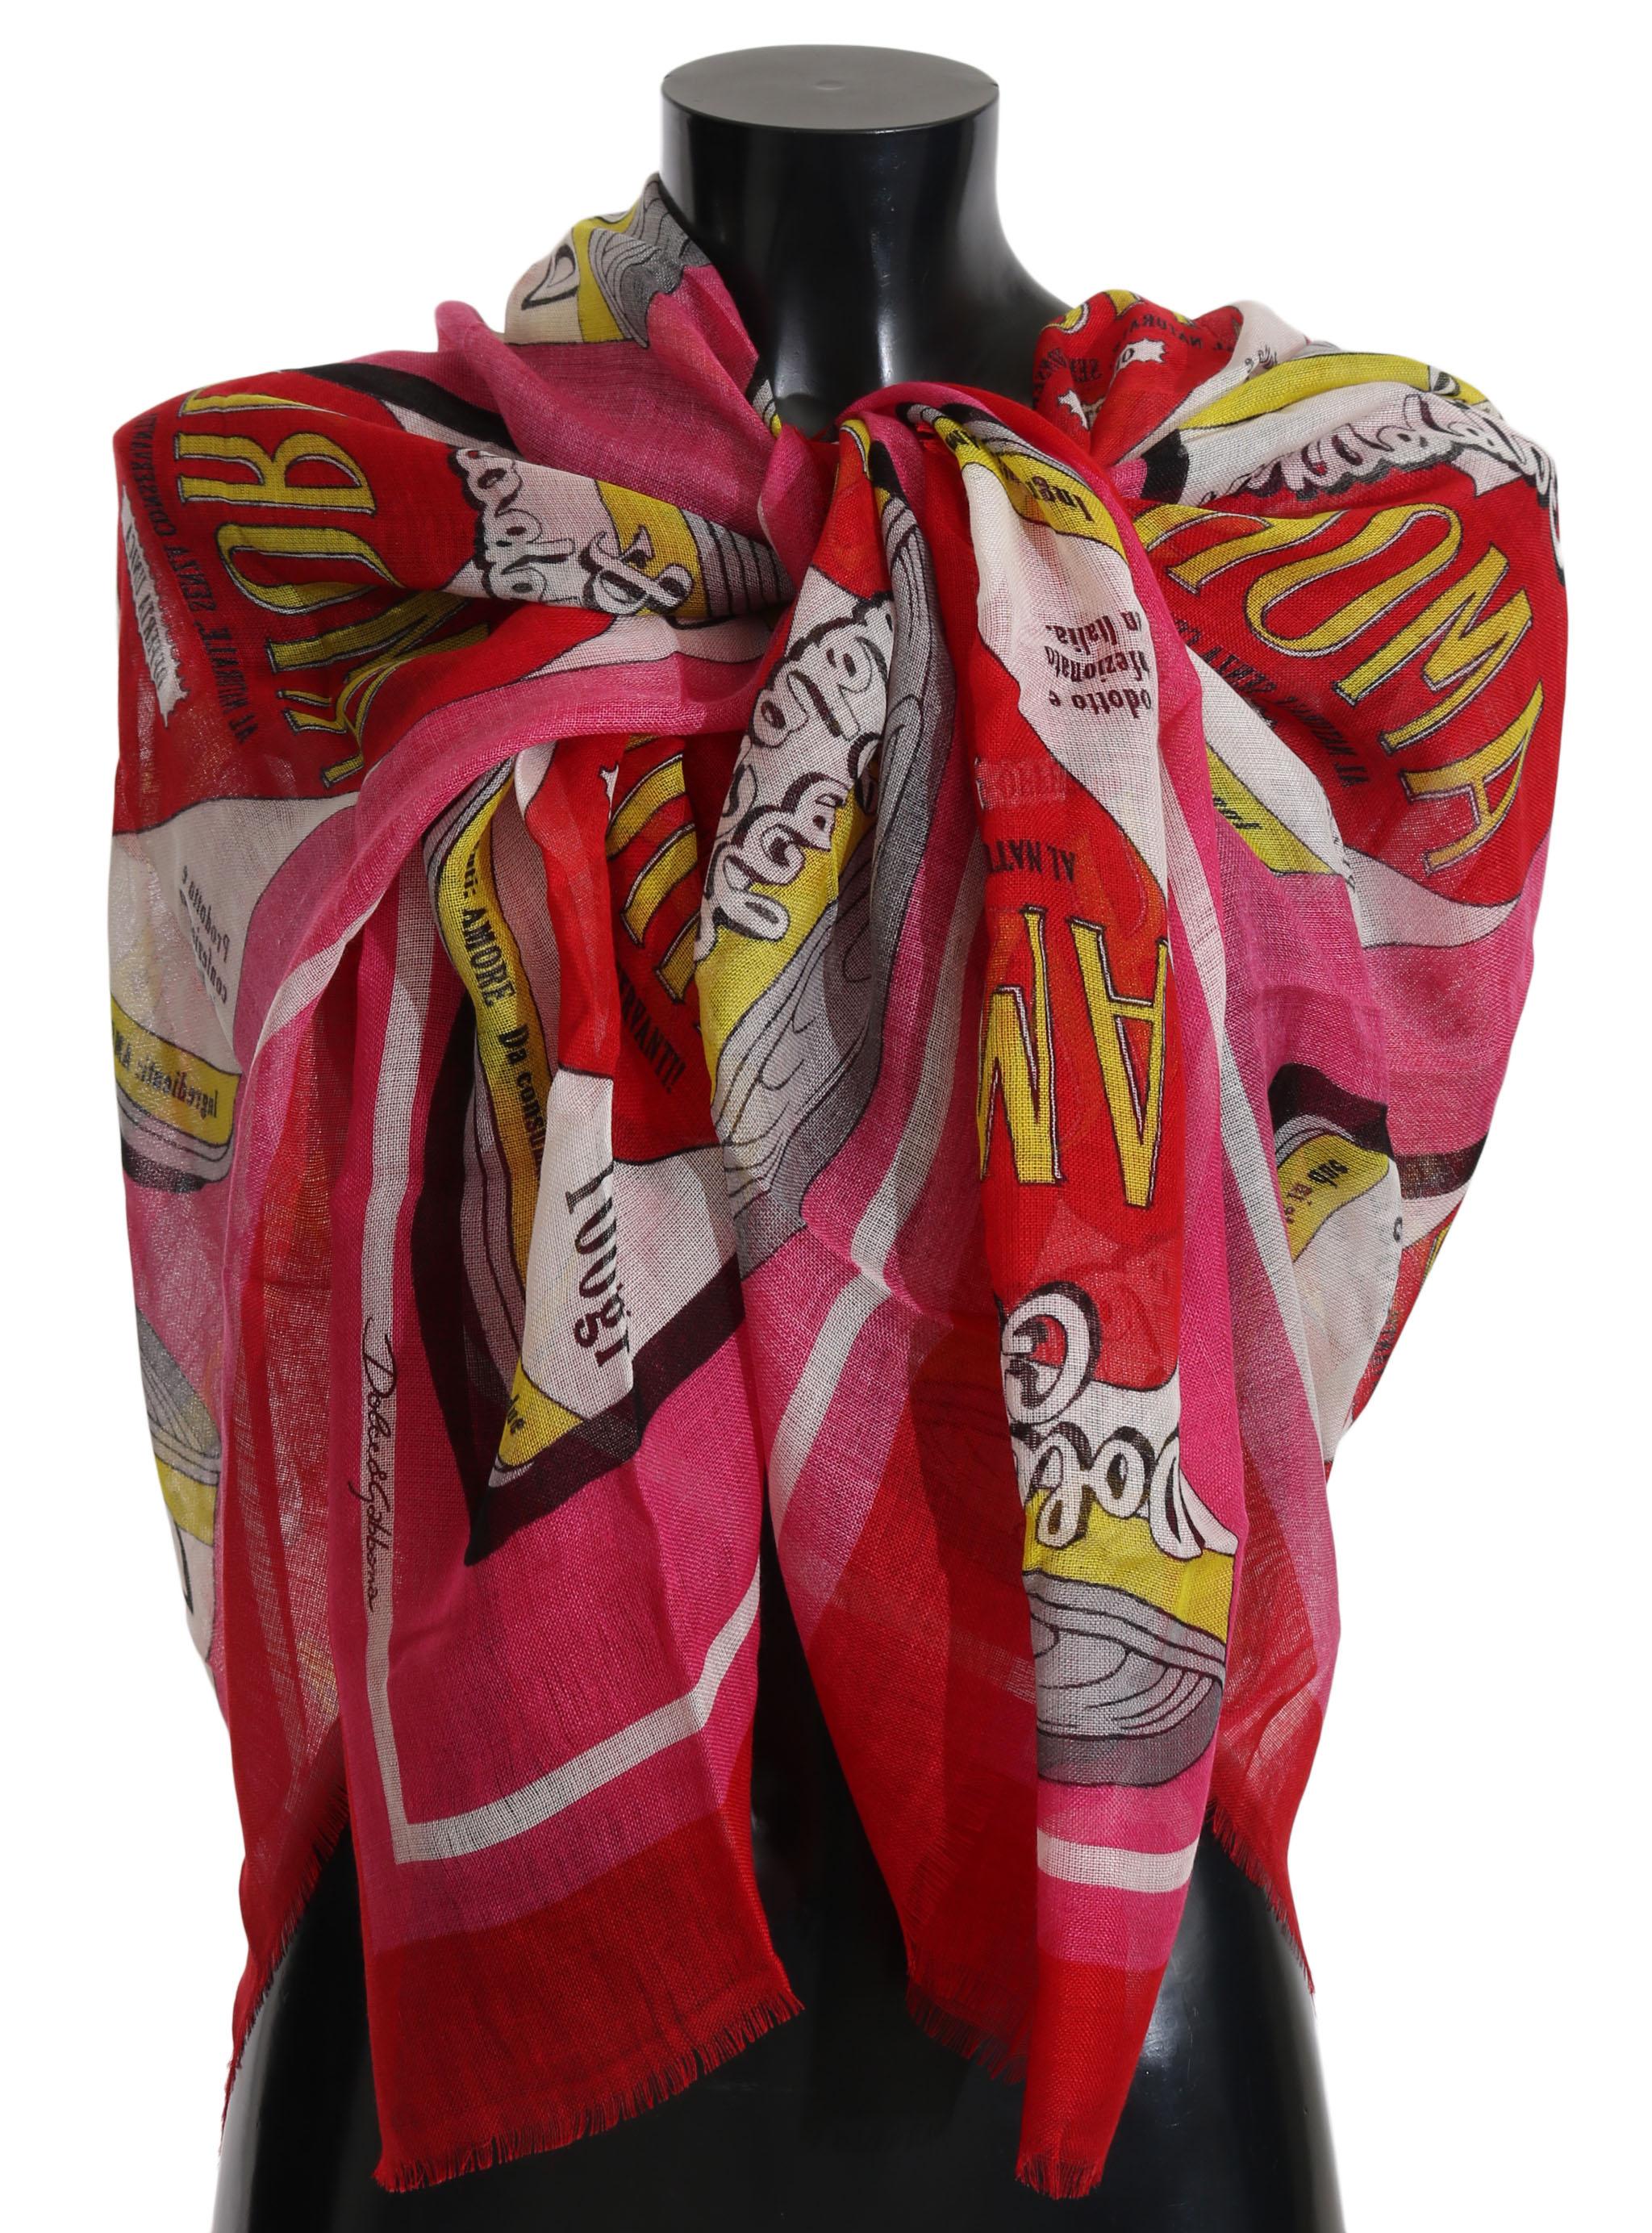 Dolce & Gabbana Women's AMORE Cashmere Silk Wrap Scarf Pink MS2479